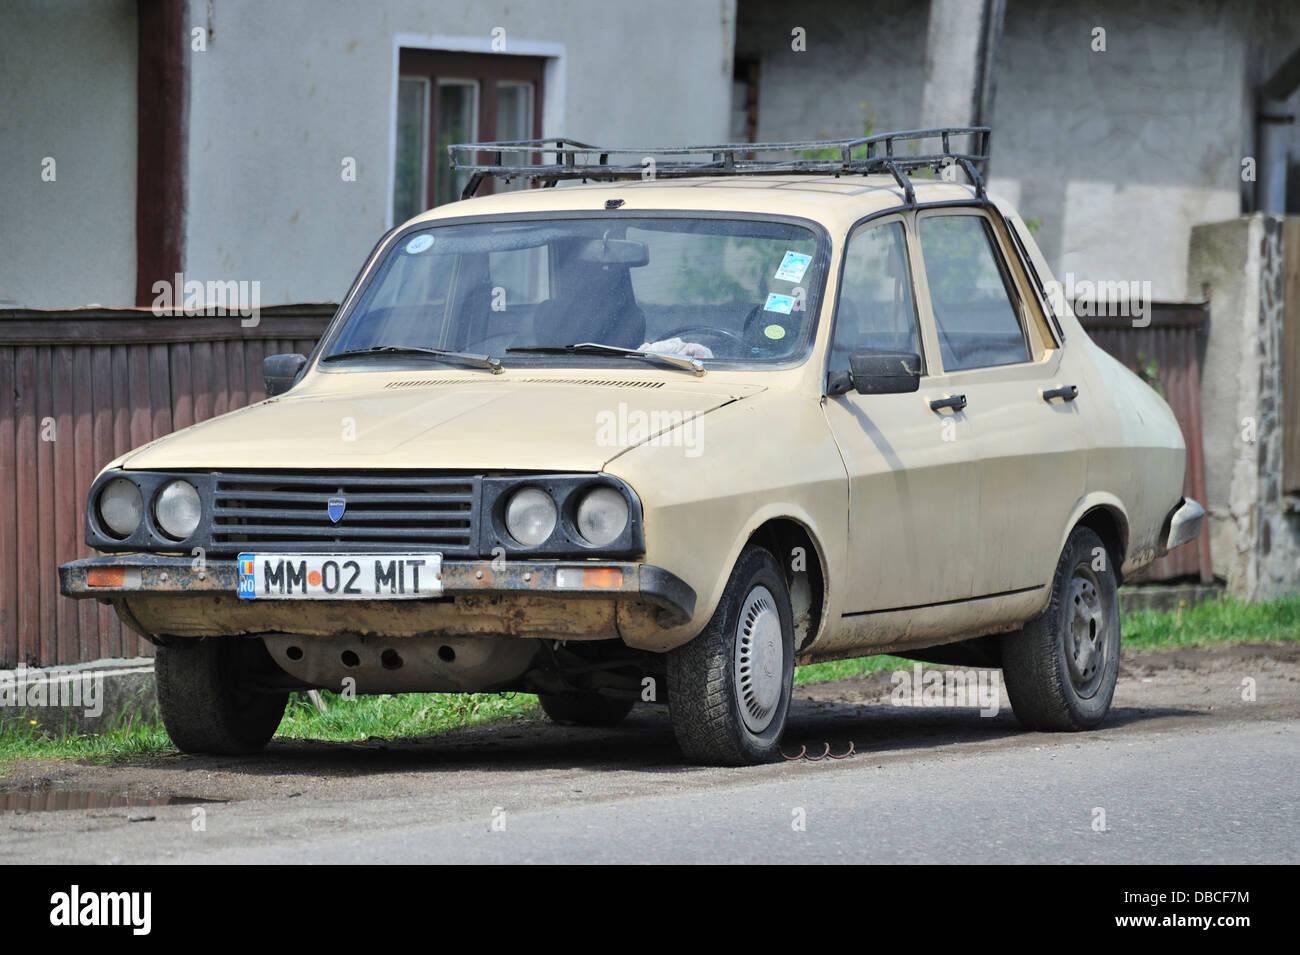 Old Dacia car, Romania Stock Photo: 58667720 - Alamy